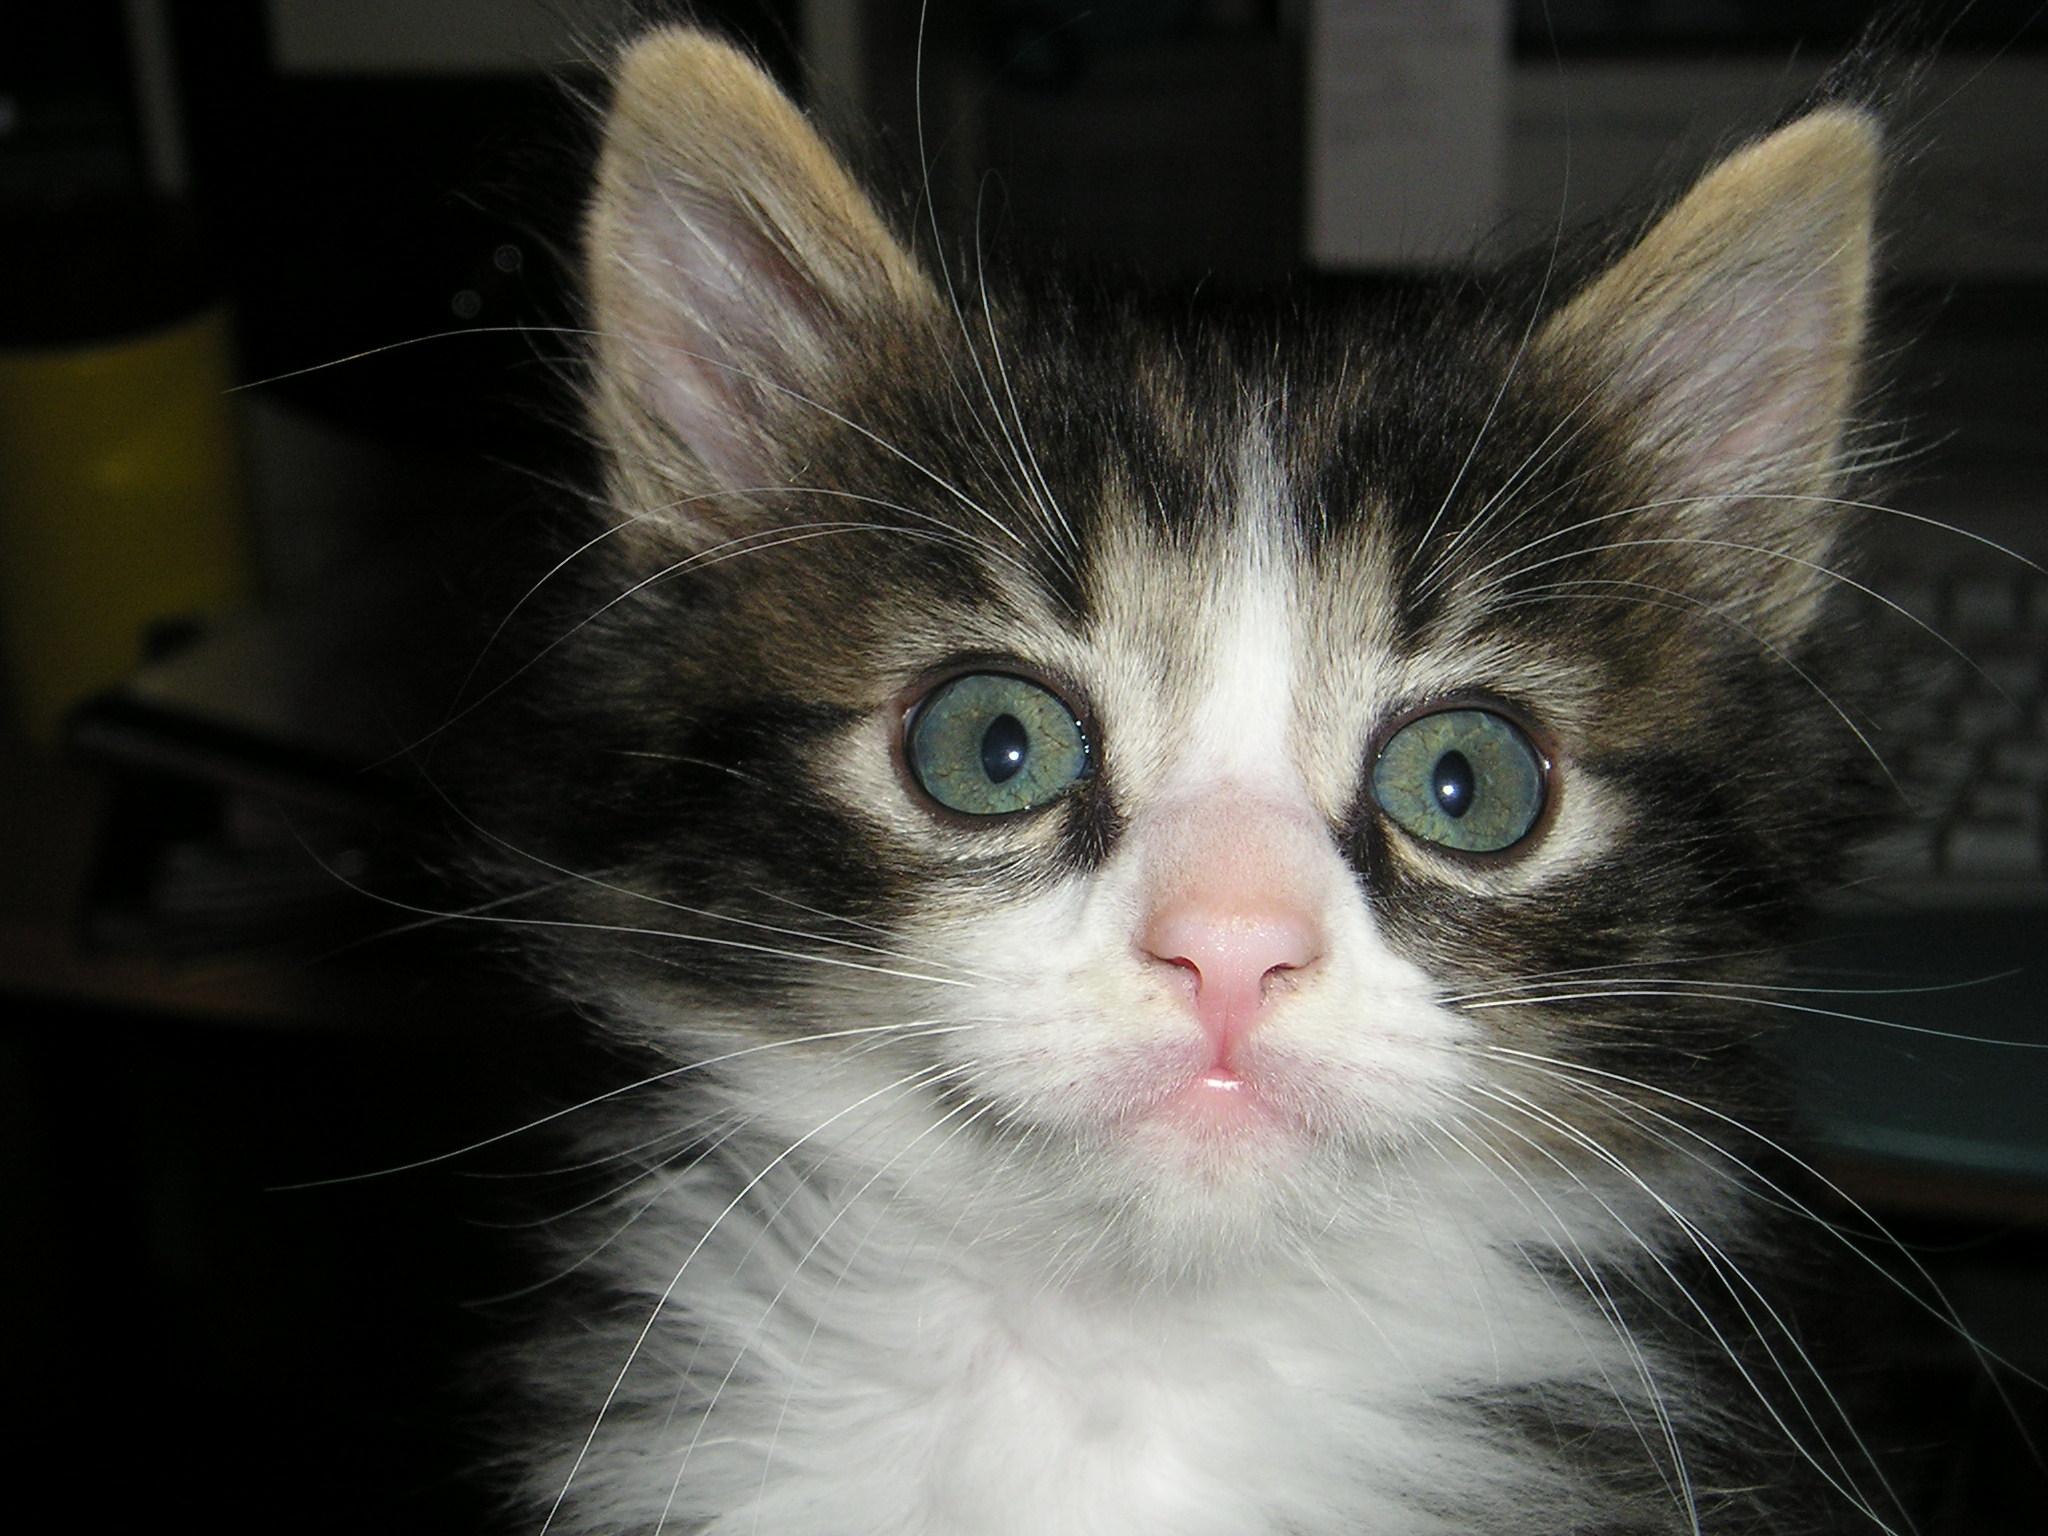 Simon-cat as the cutest kitten freaking ever. 2007.